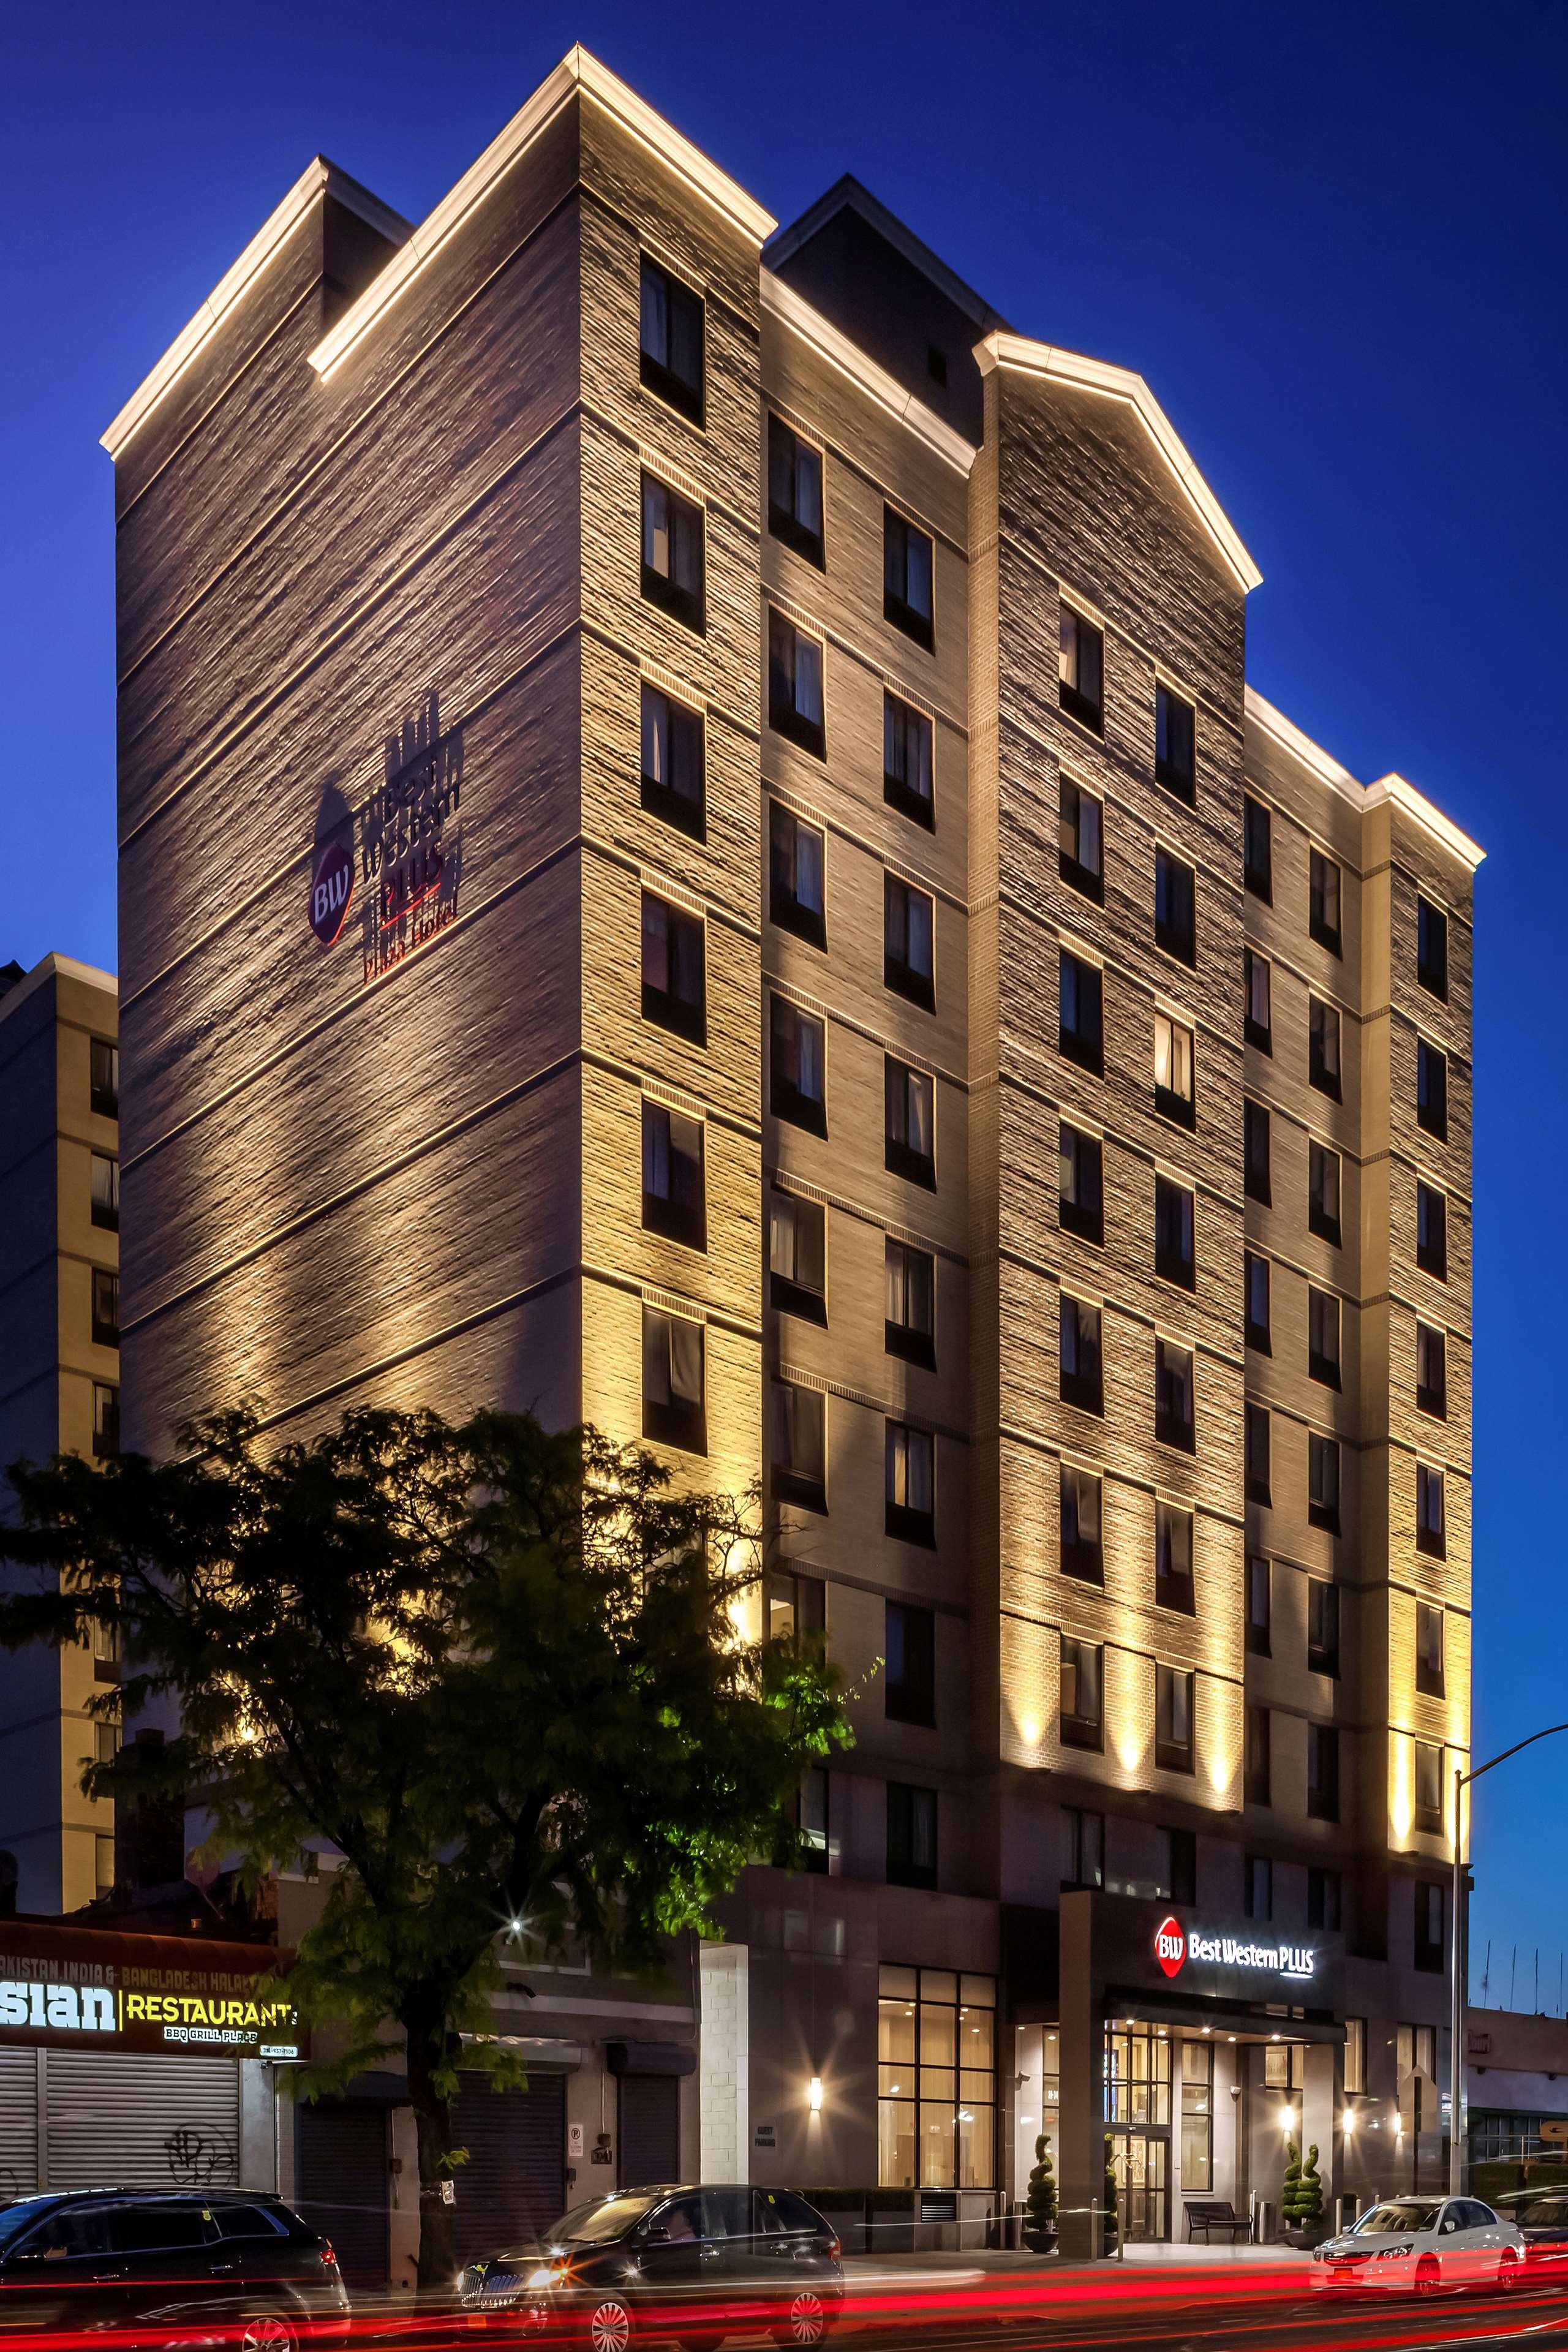 Best Western Plus Plaza Hotel image 2